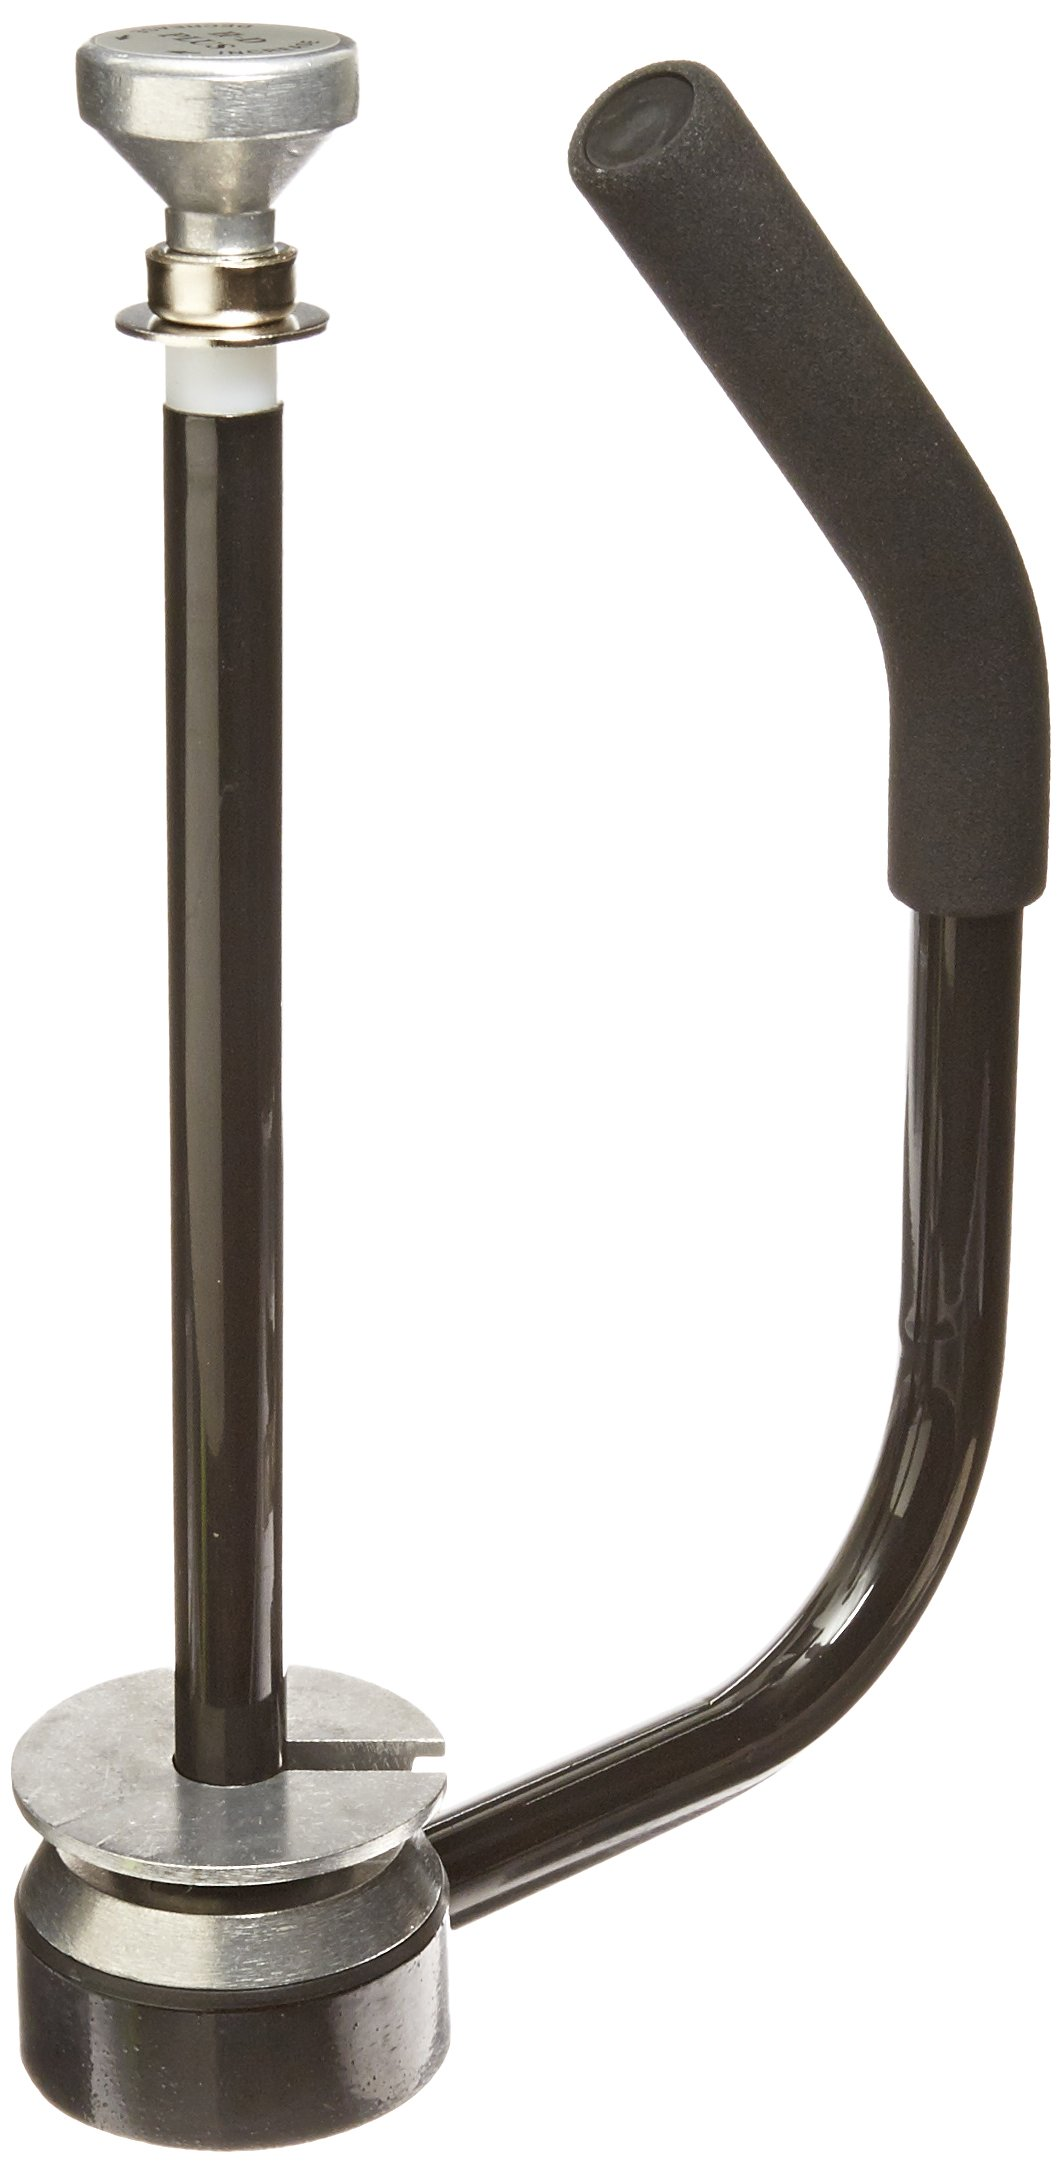 Aviditi SFDIS277 Heavy-Duty Stretch Film Dispenser with Knob Grip, 20'' Height, Black